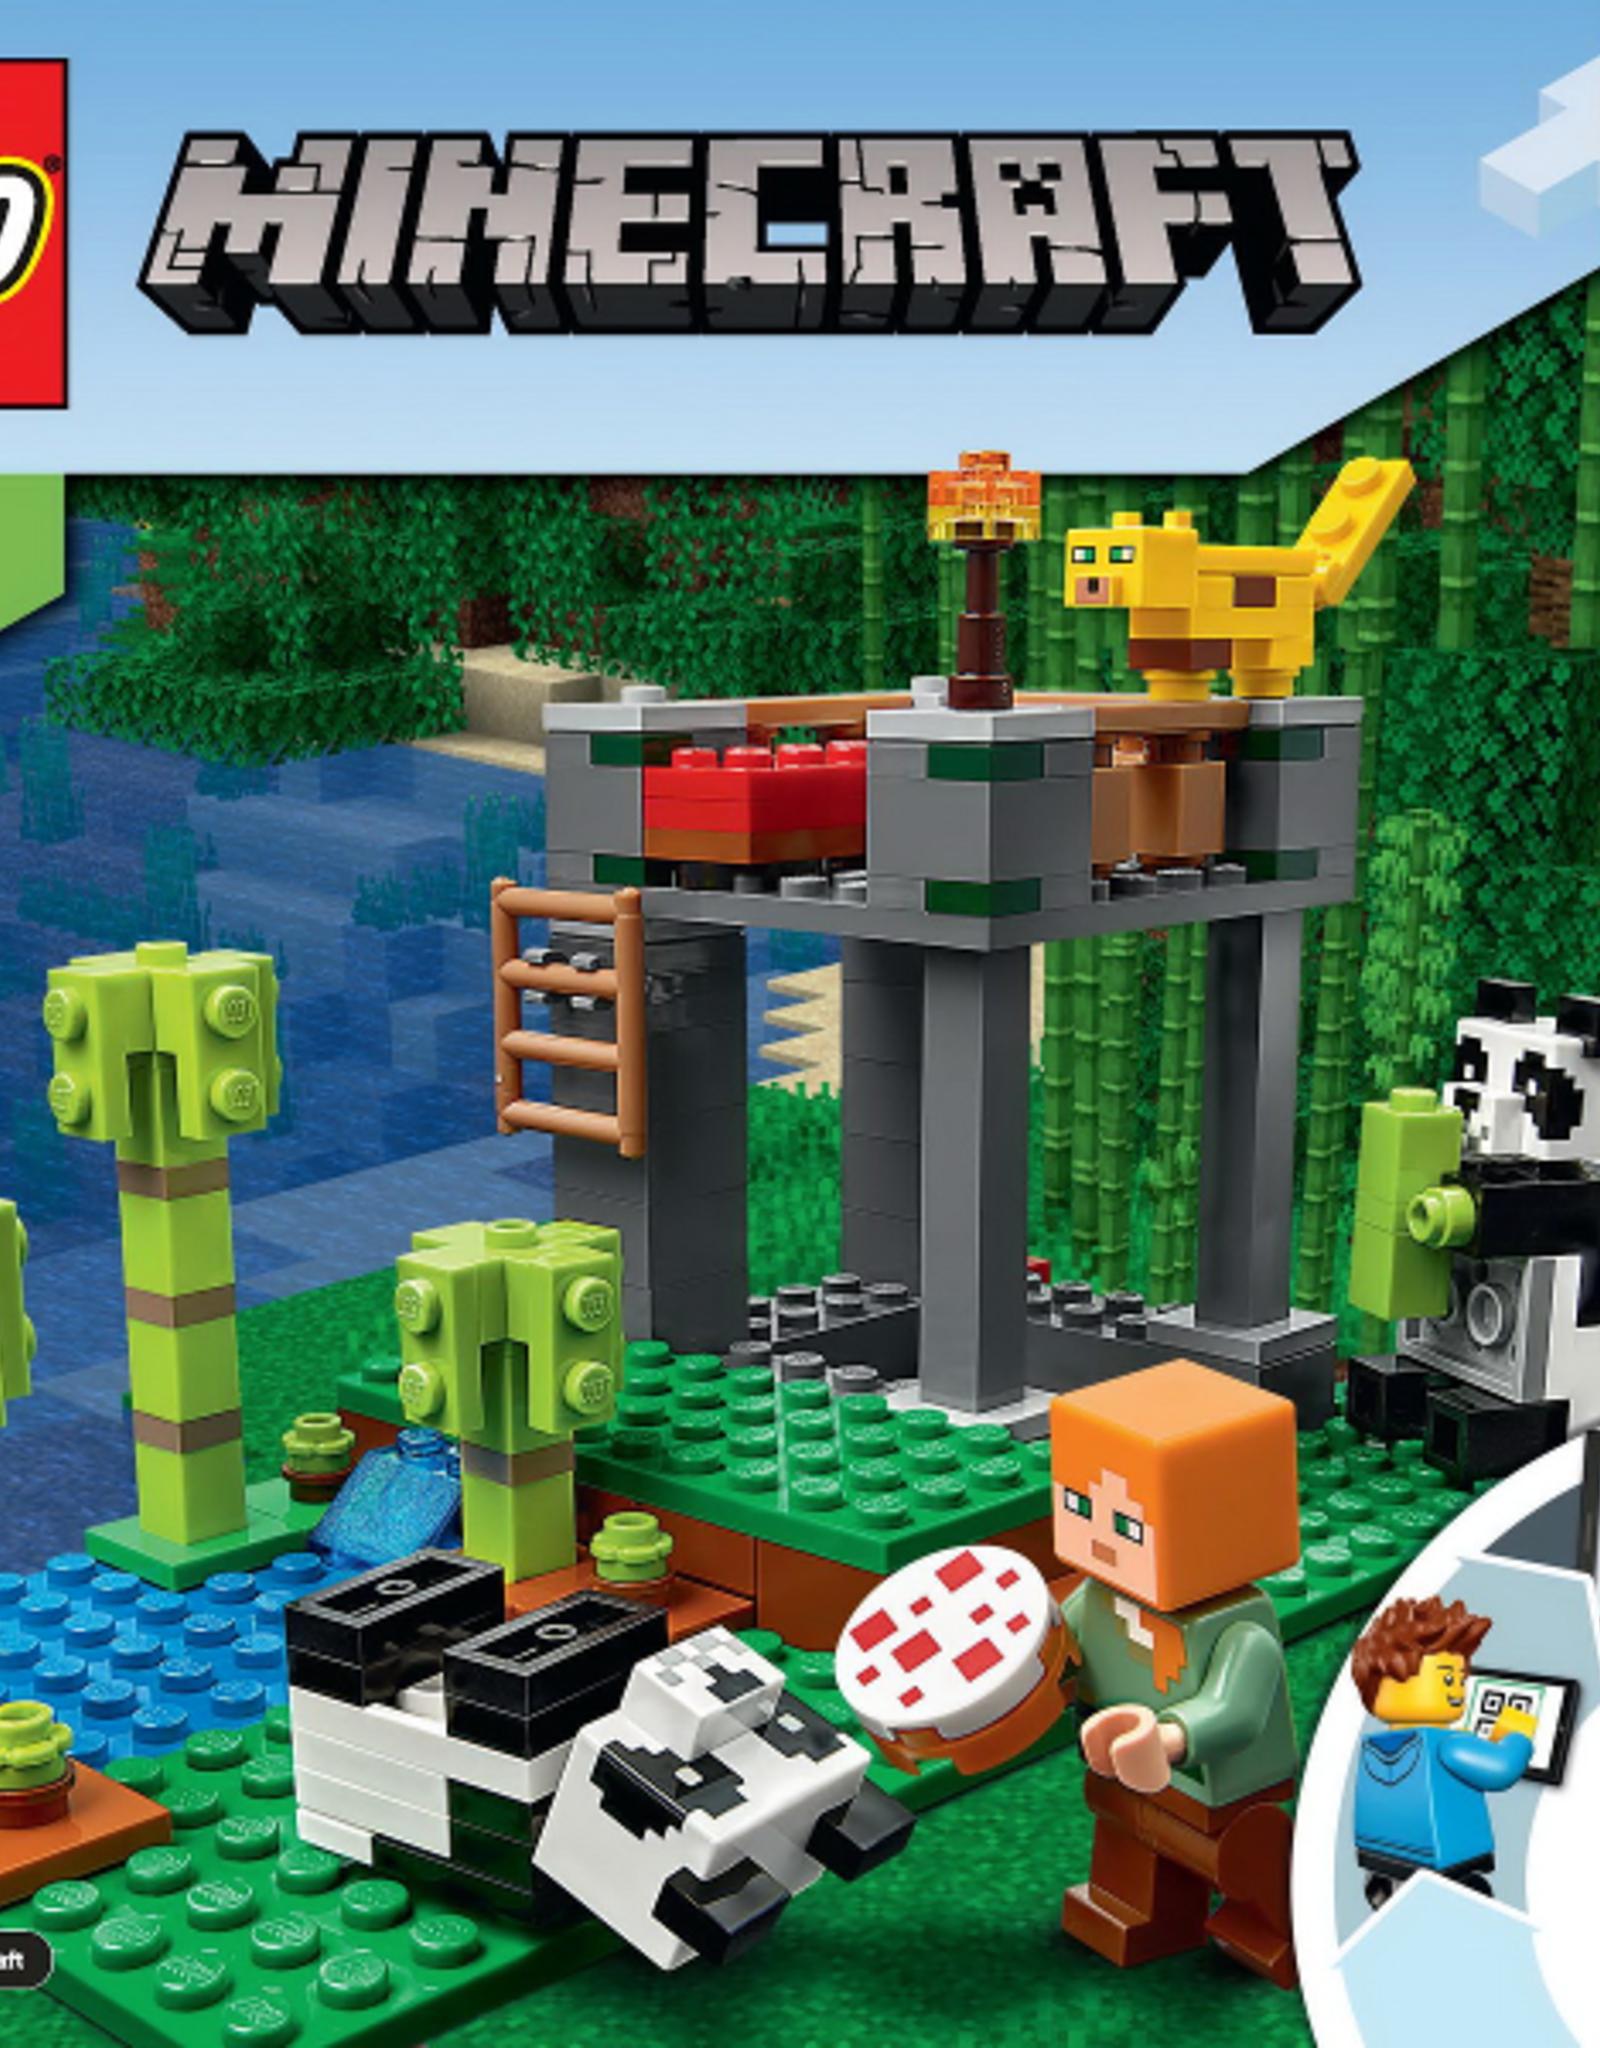 LEGO LEGO 21158 The Panda Nursery MINECRAFT